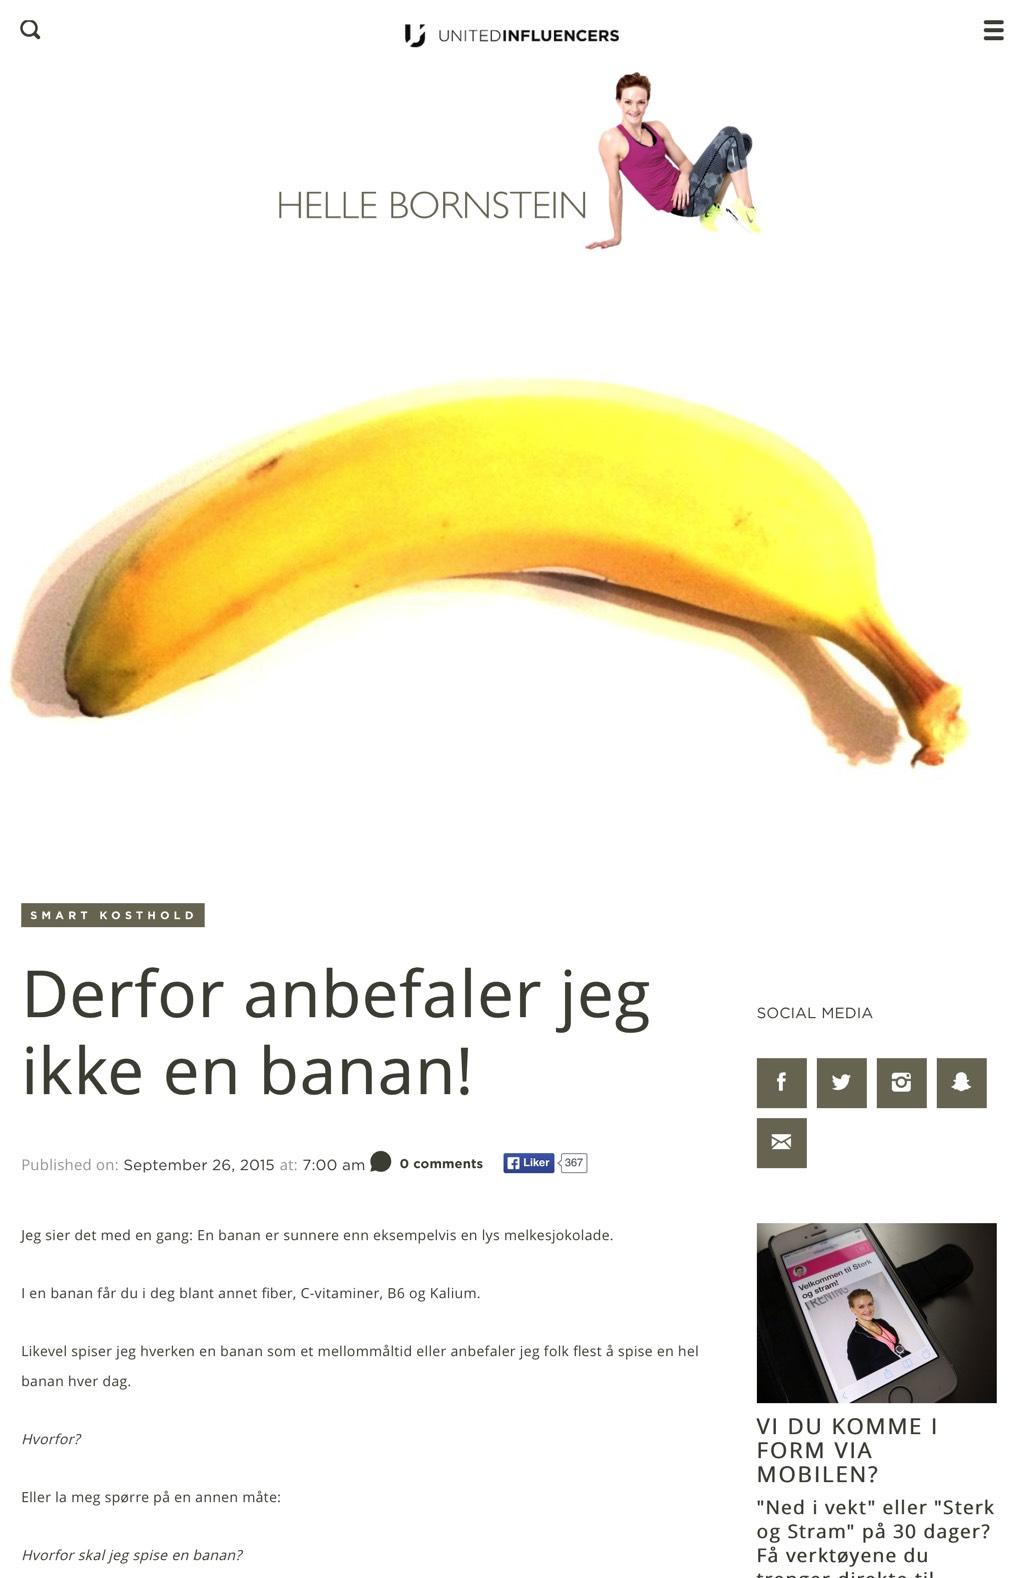 Helle bornstein banan